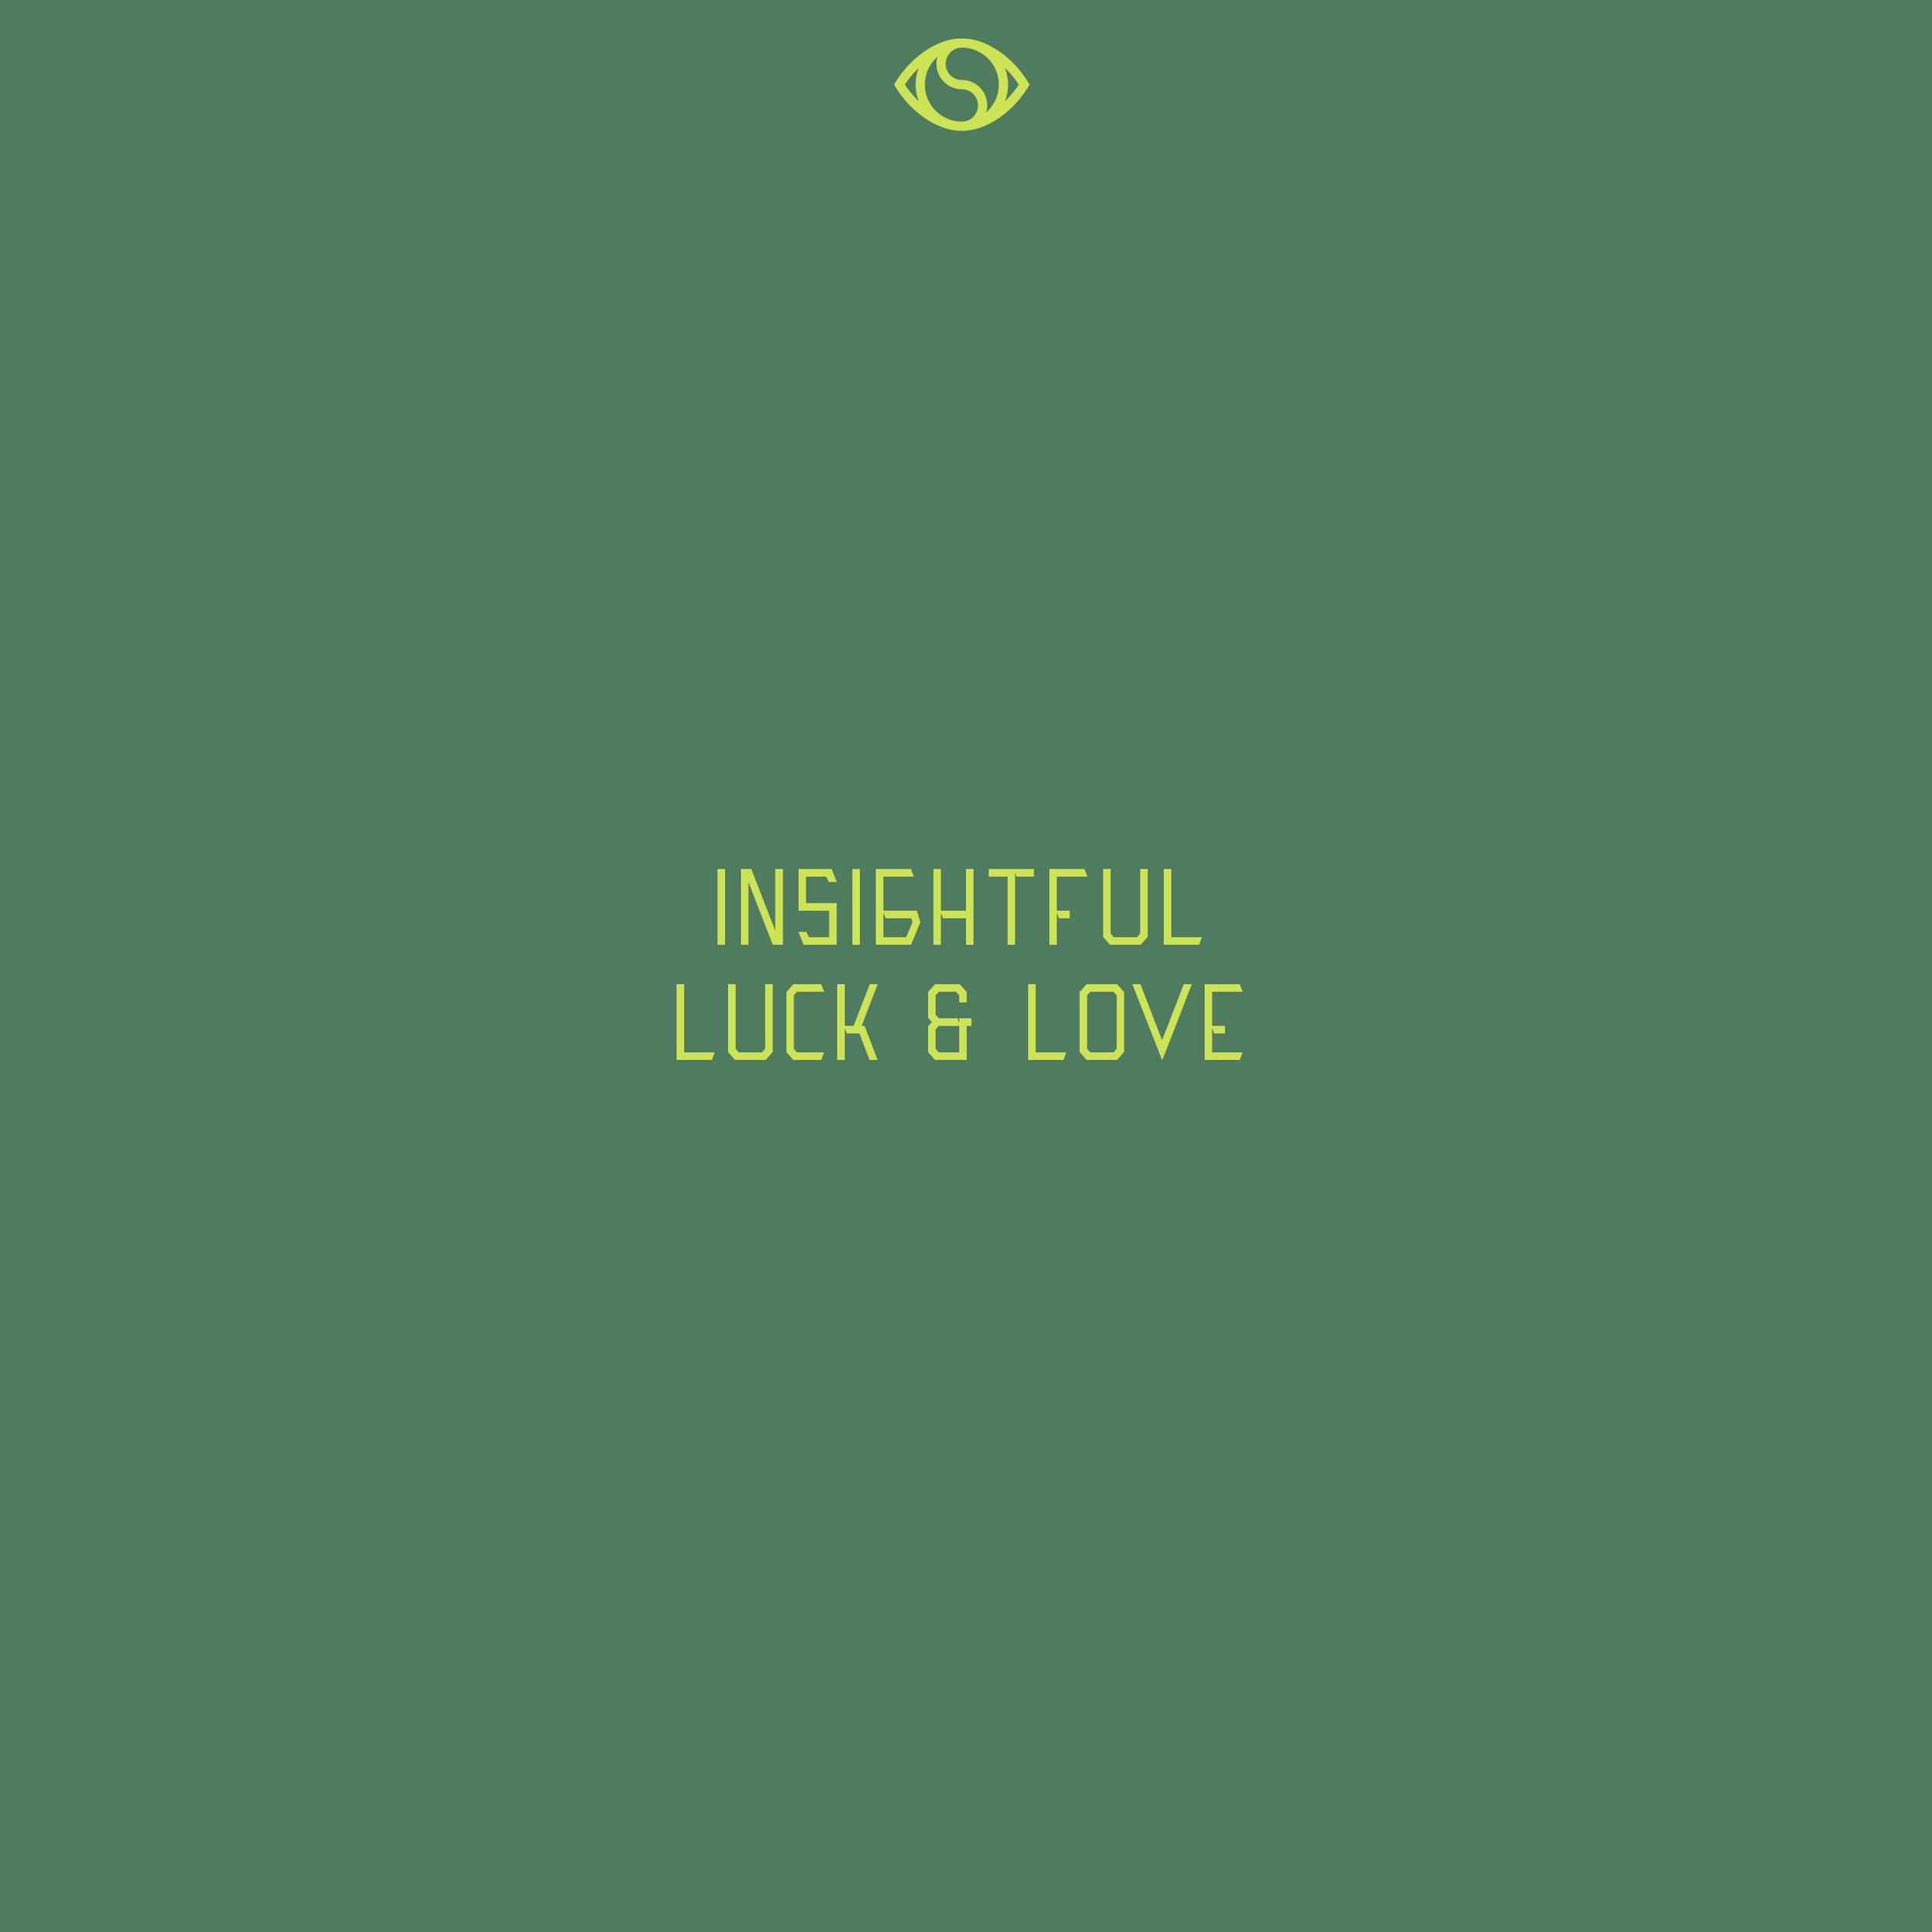 INSIGHTFUL    LUCK & LOVE